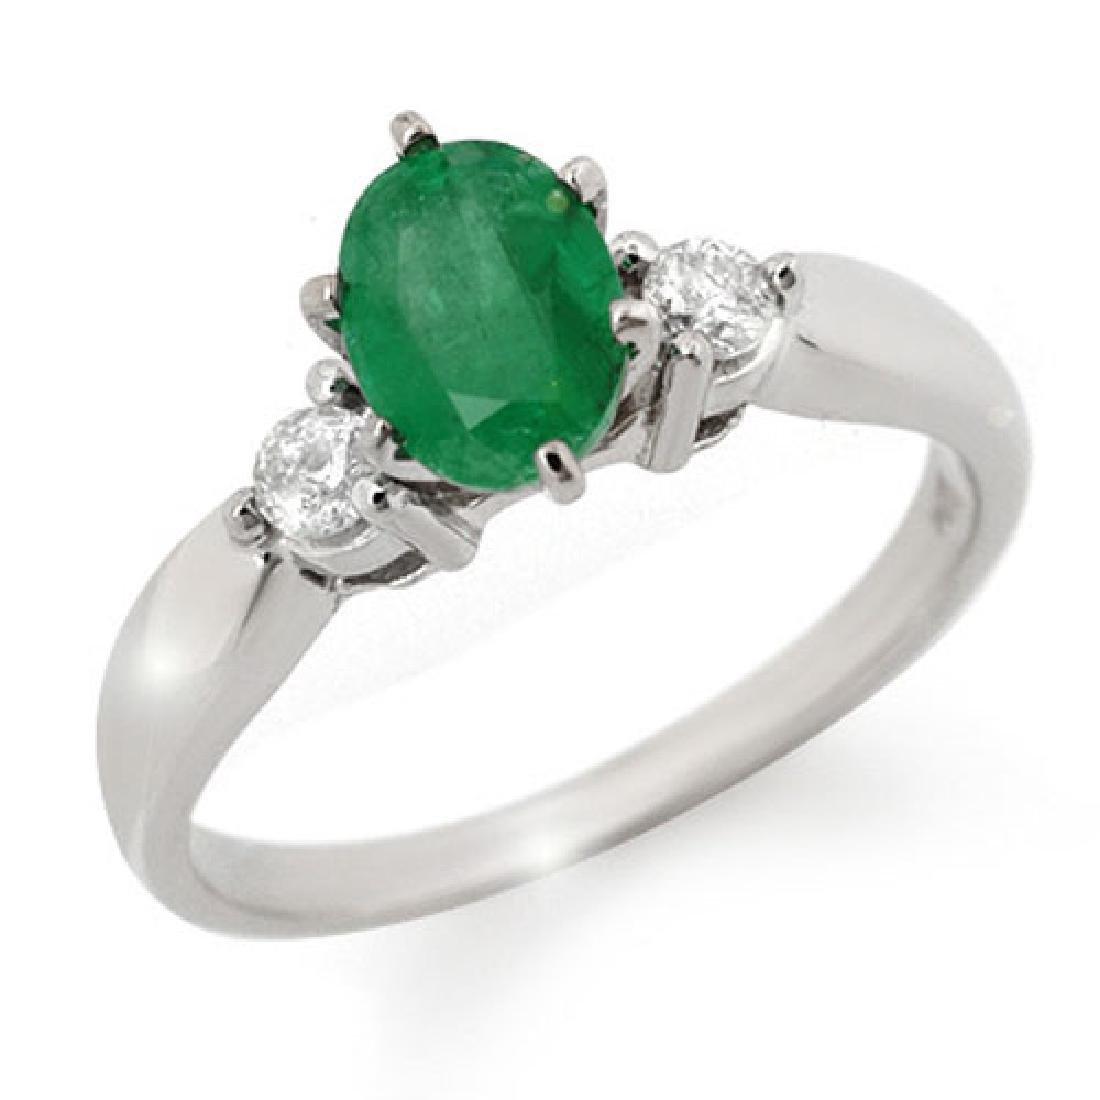 1.20 CTW Emerald & Diamond Ring 18K White Gold - 2